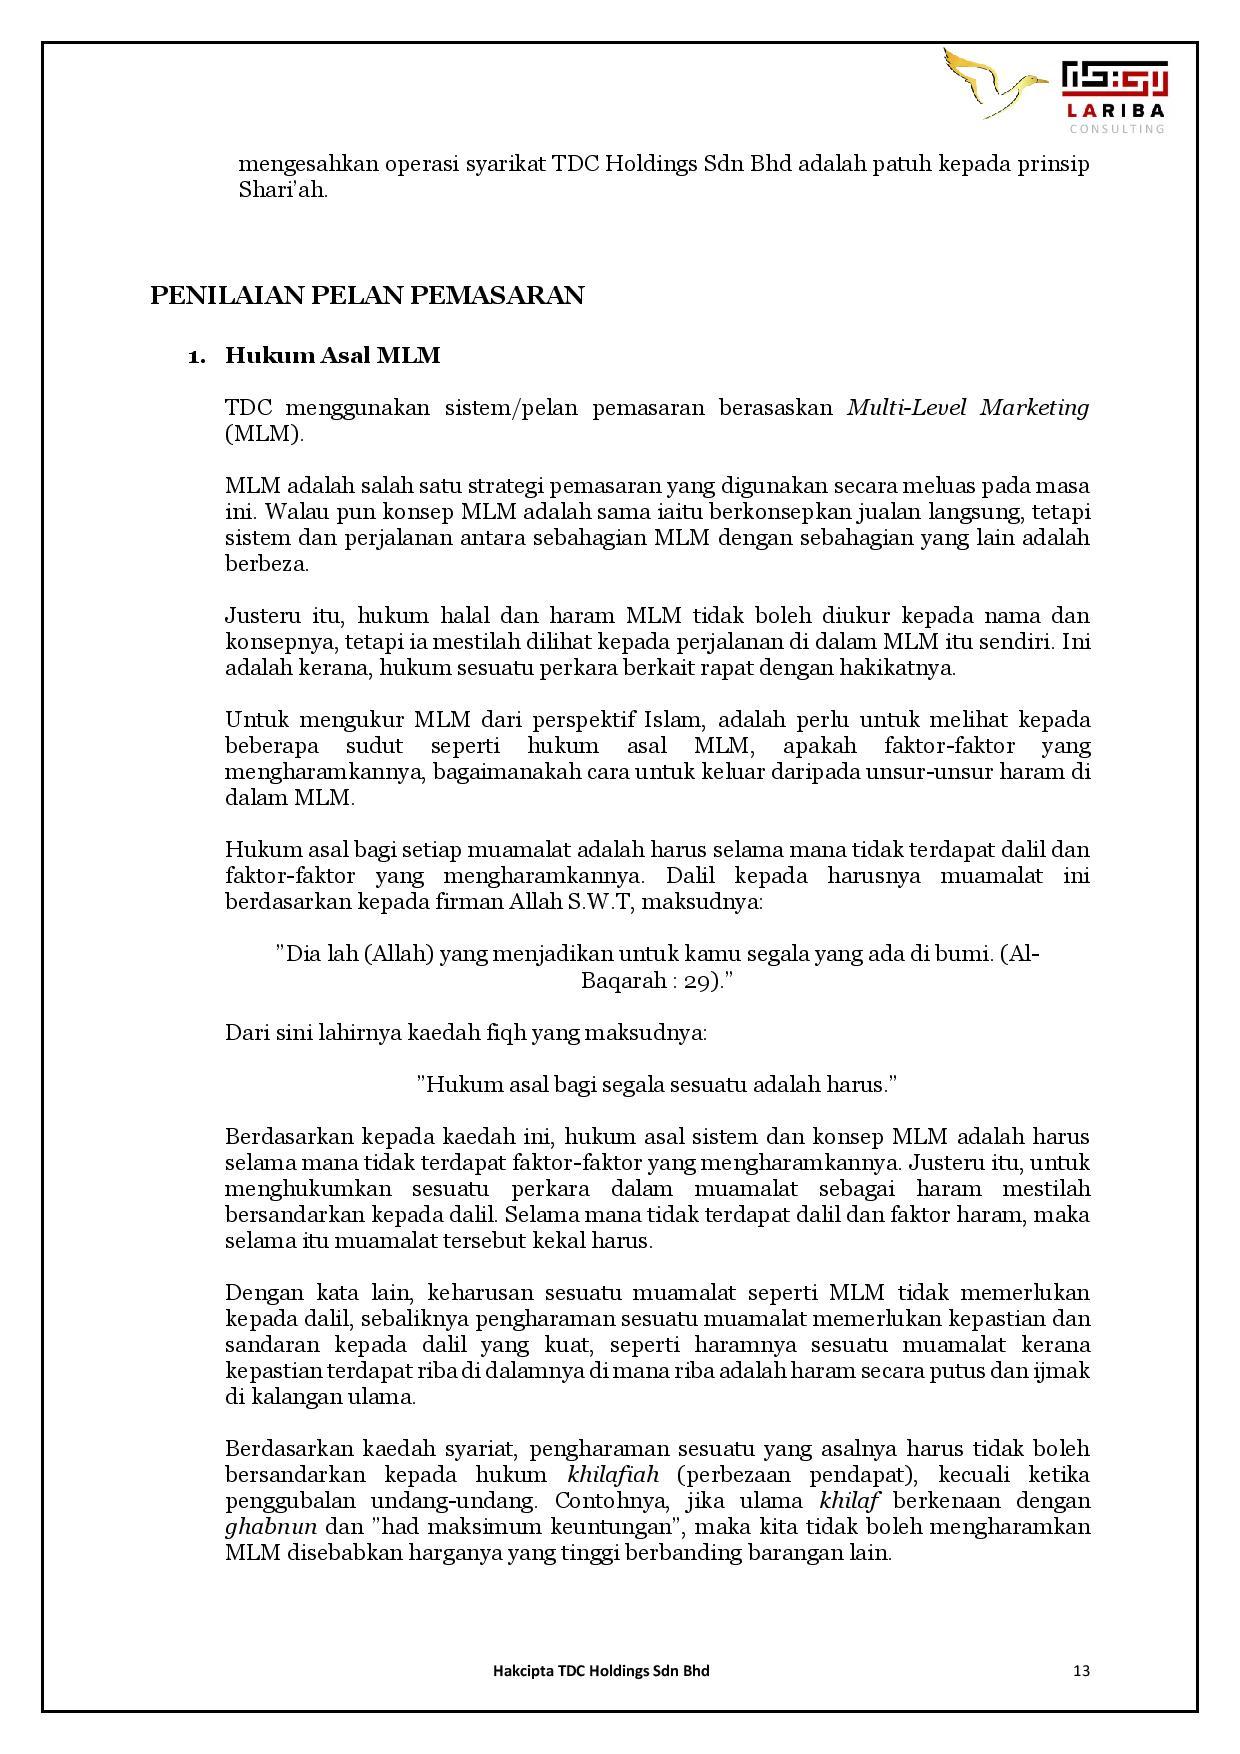 Huraian Penilaian Syariah TDC 210121 (1)-page-013